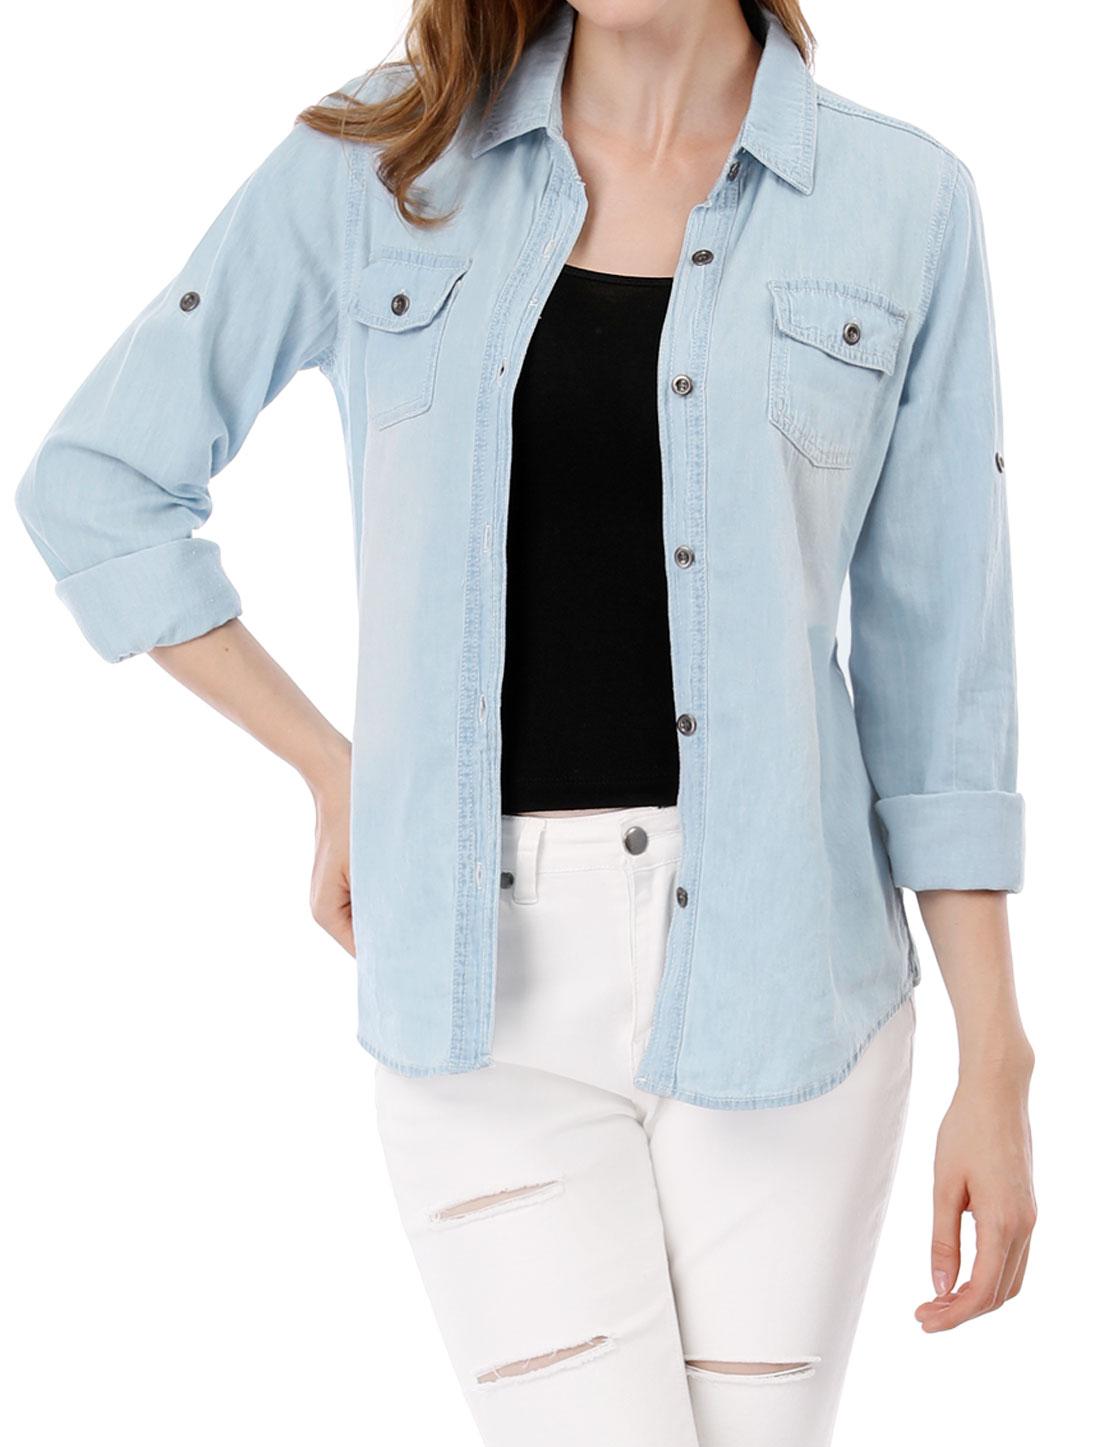 Lady Long Sleeves Point Collar Casual Western Denim Shirt Light Blue M